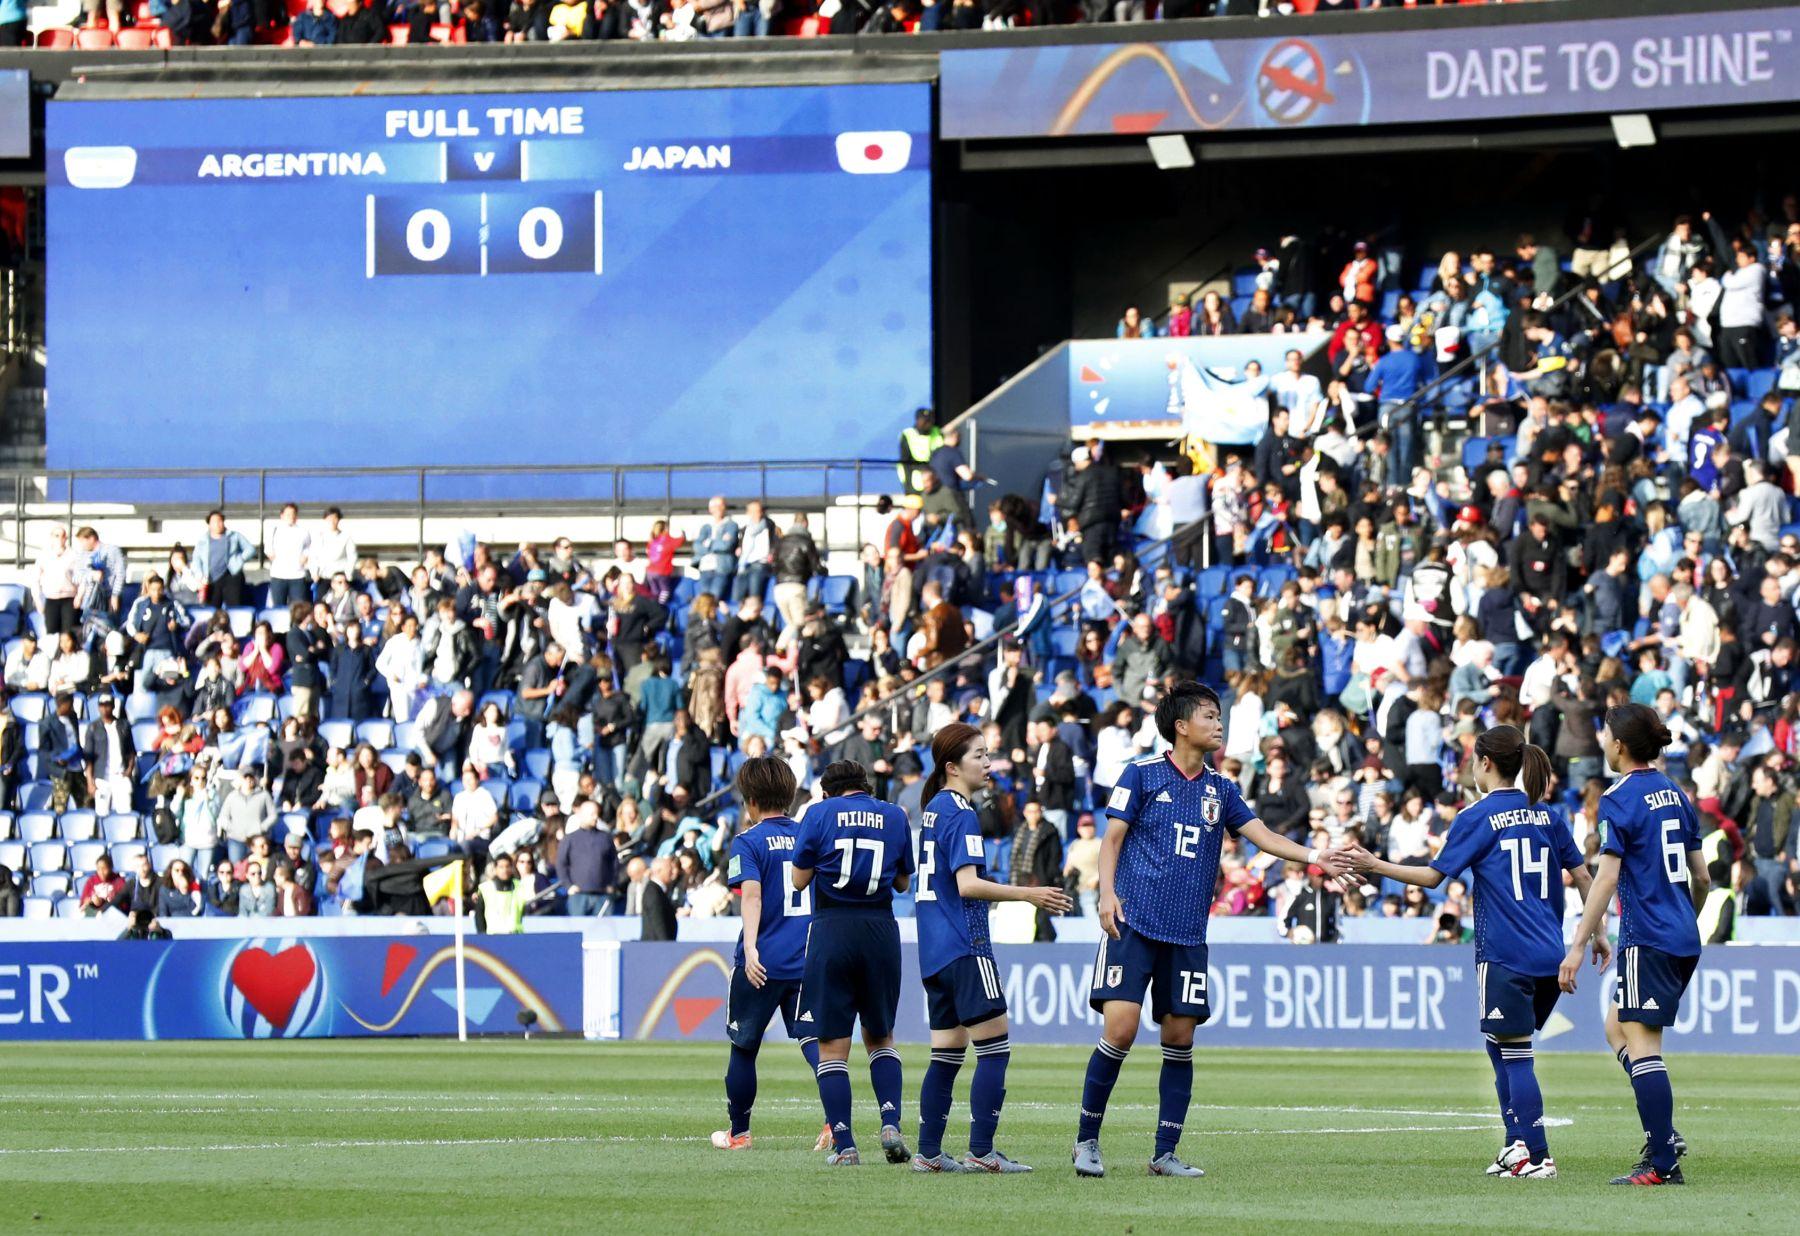 2019 FIFA Women's World Cup Japan vs Argentina 013